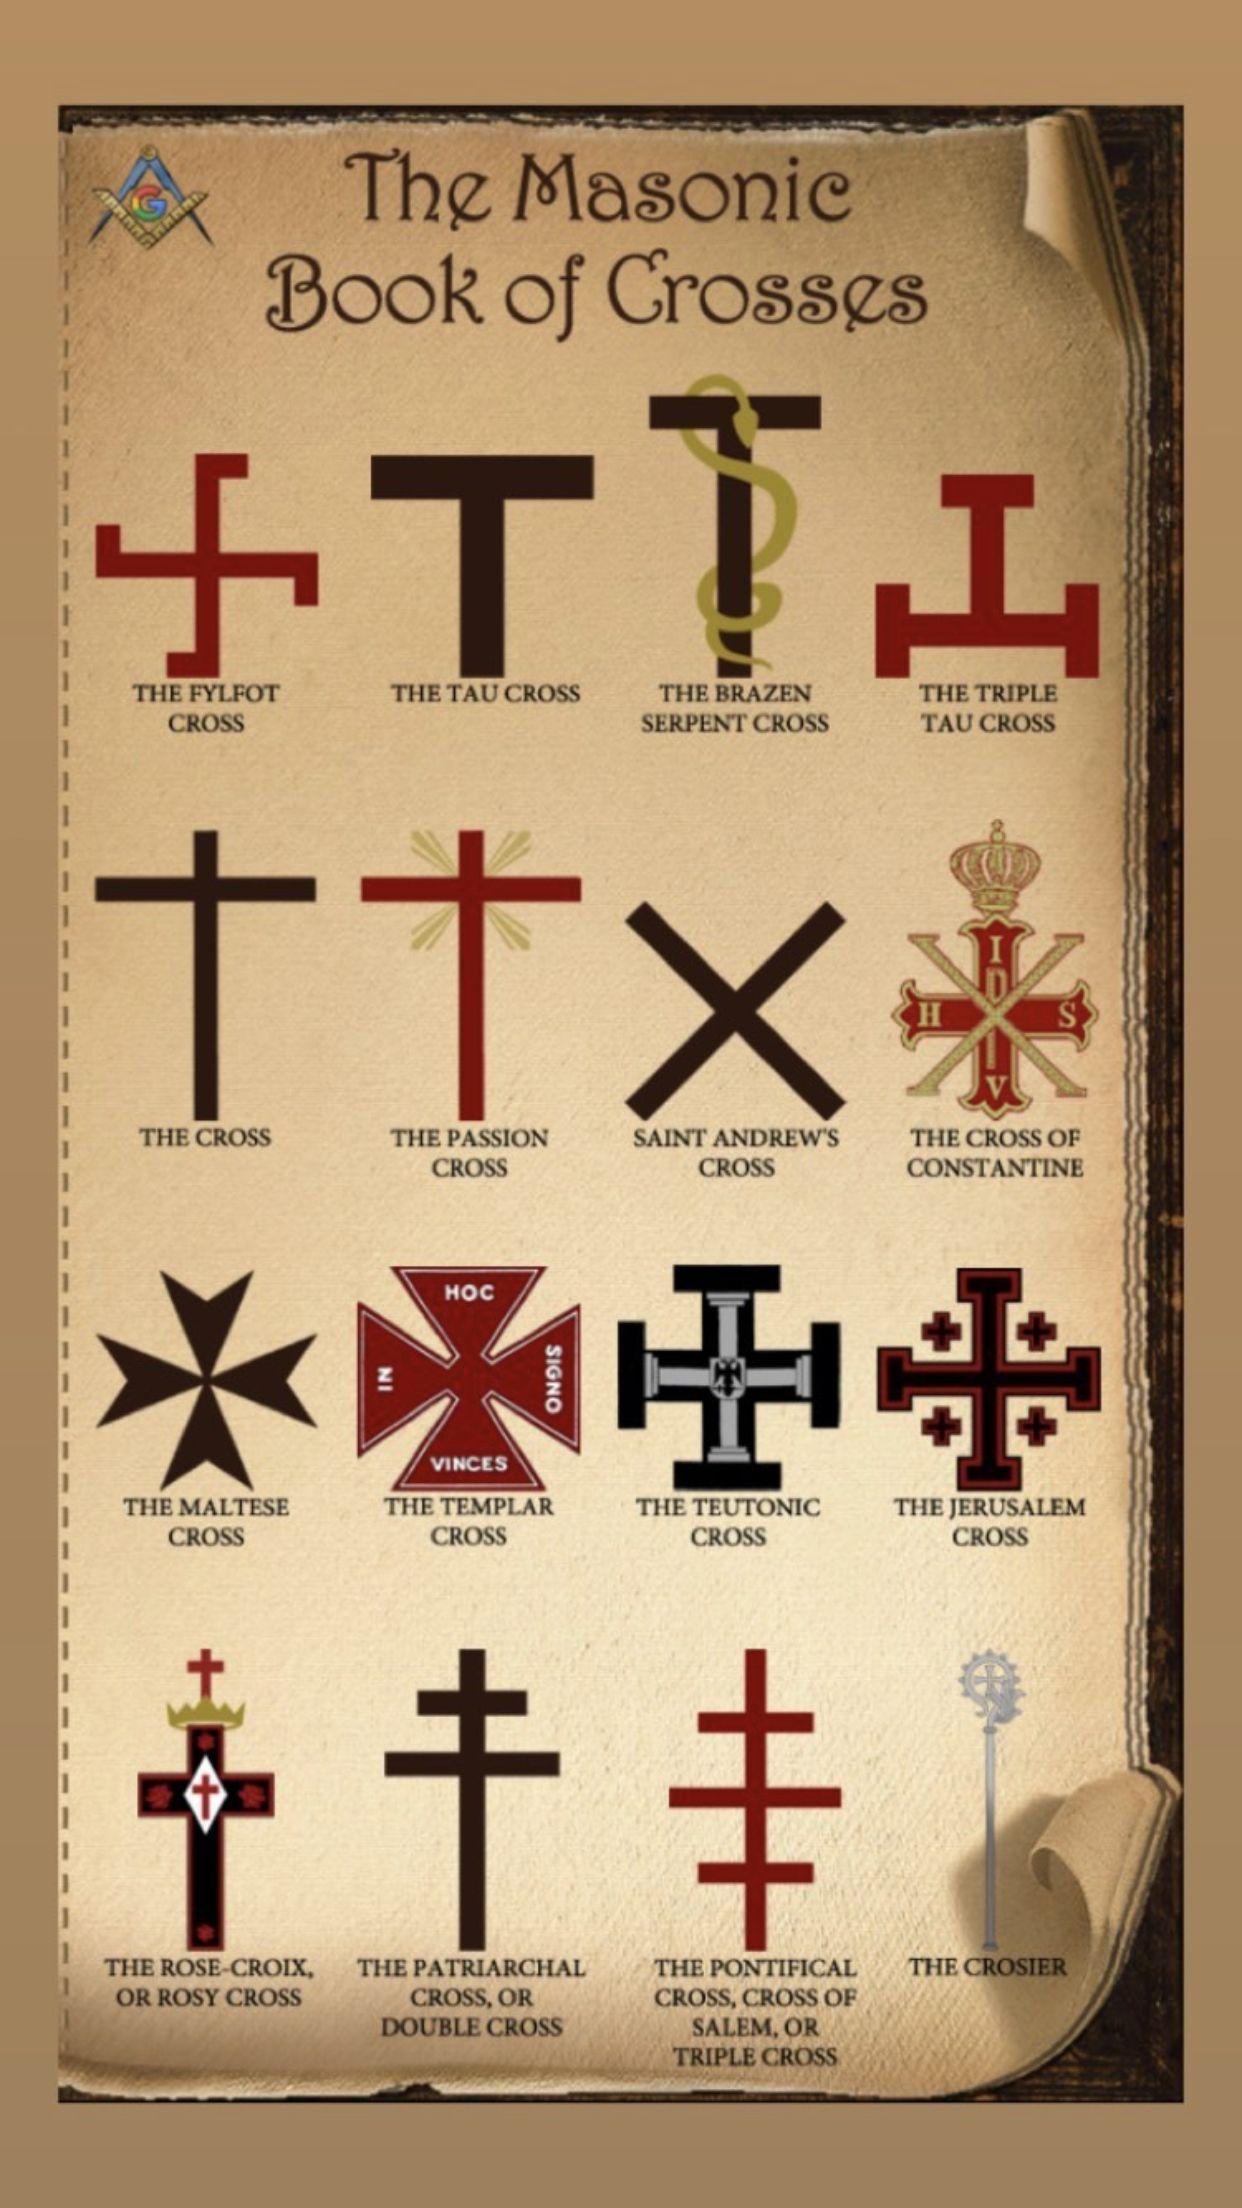 Pin By Thomas Bell On Cars In 2020 Masonic Symbols Masonic Art Freemasonry